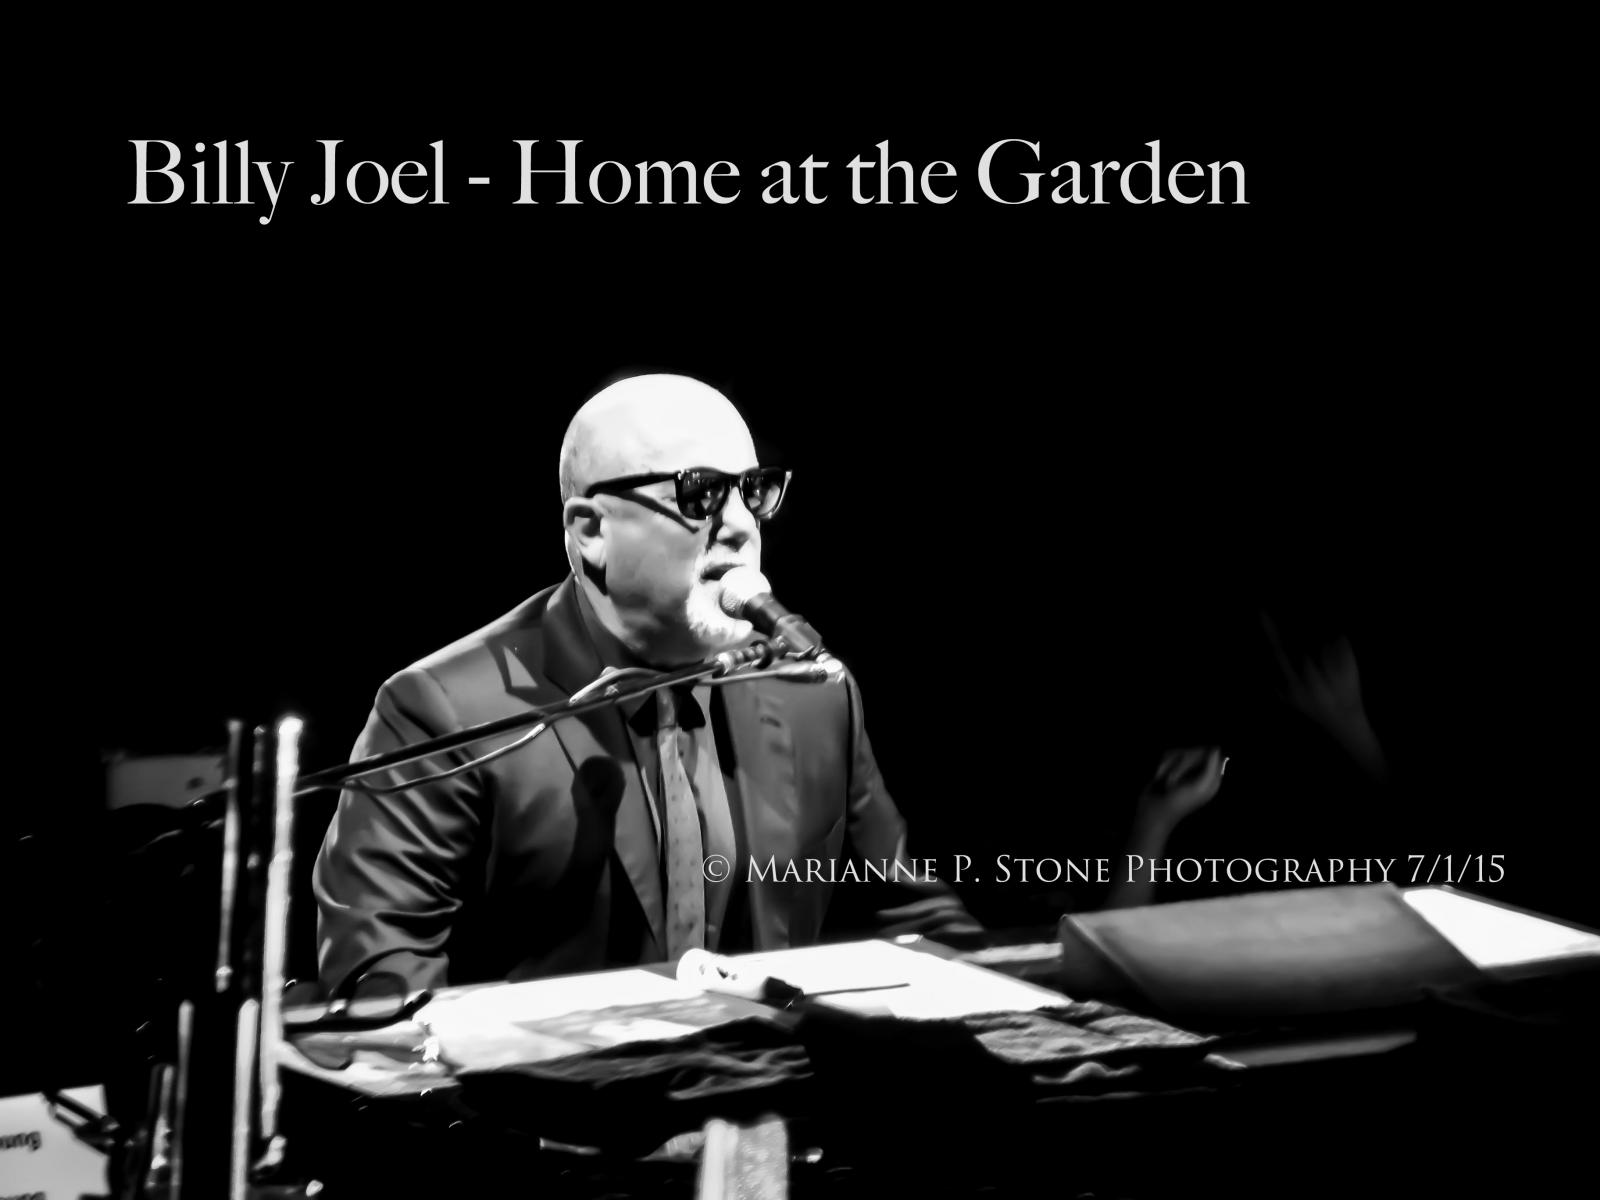 DSCN0301-2-Edit-Billy-Joel-Home-at-the-Garden-MPS